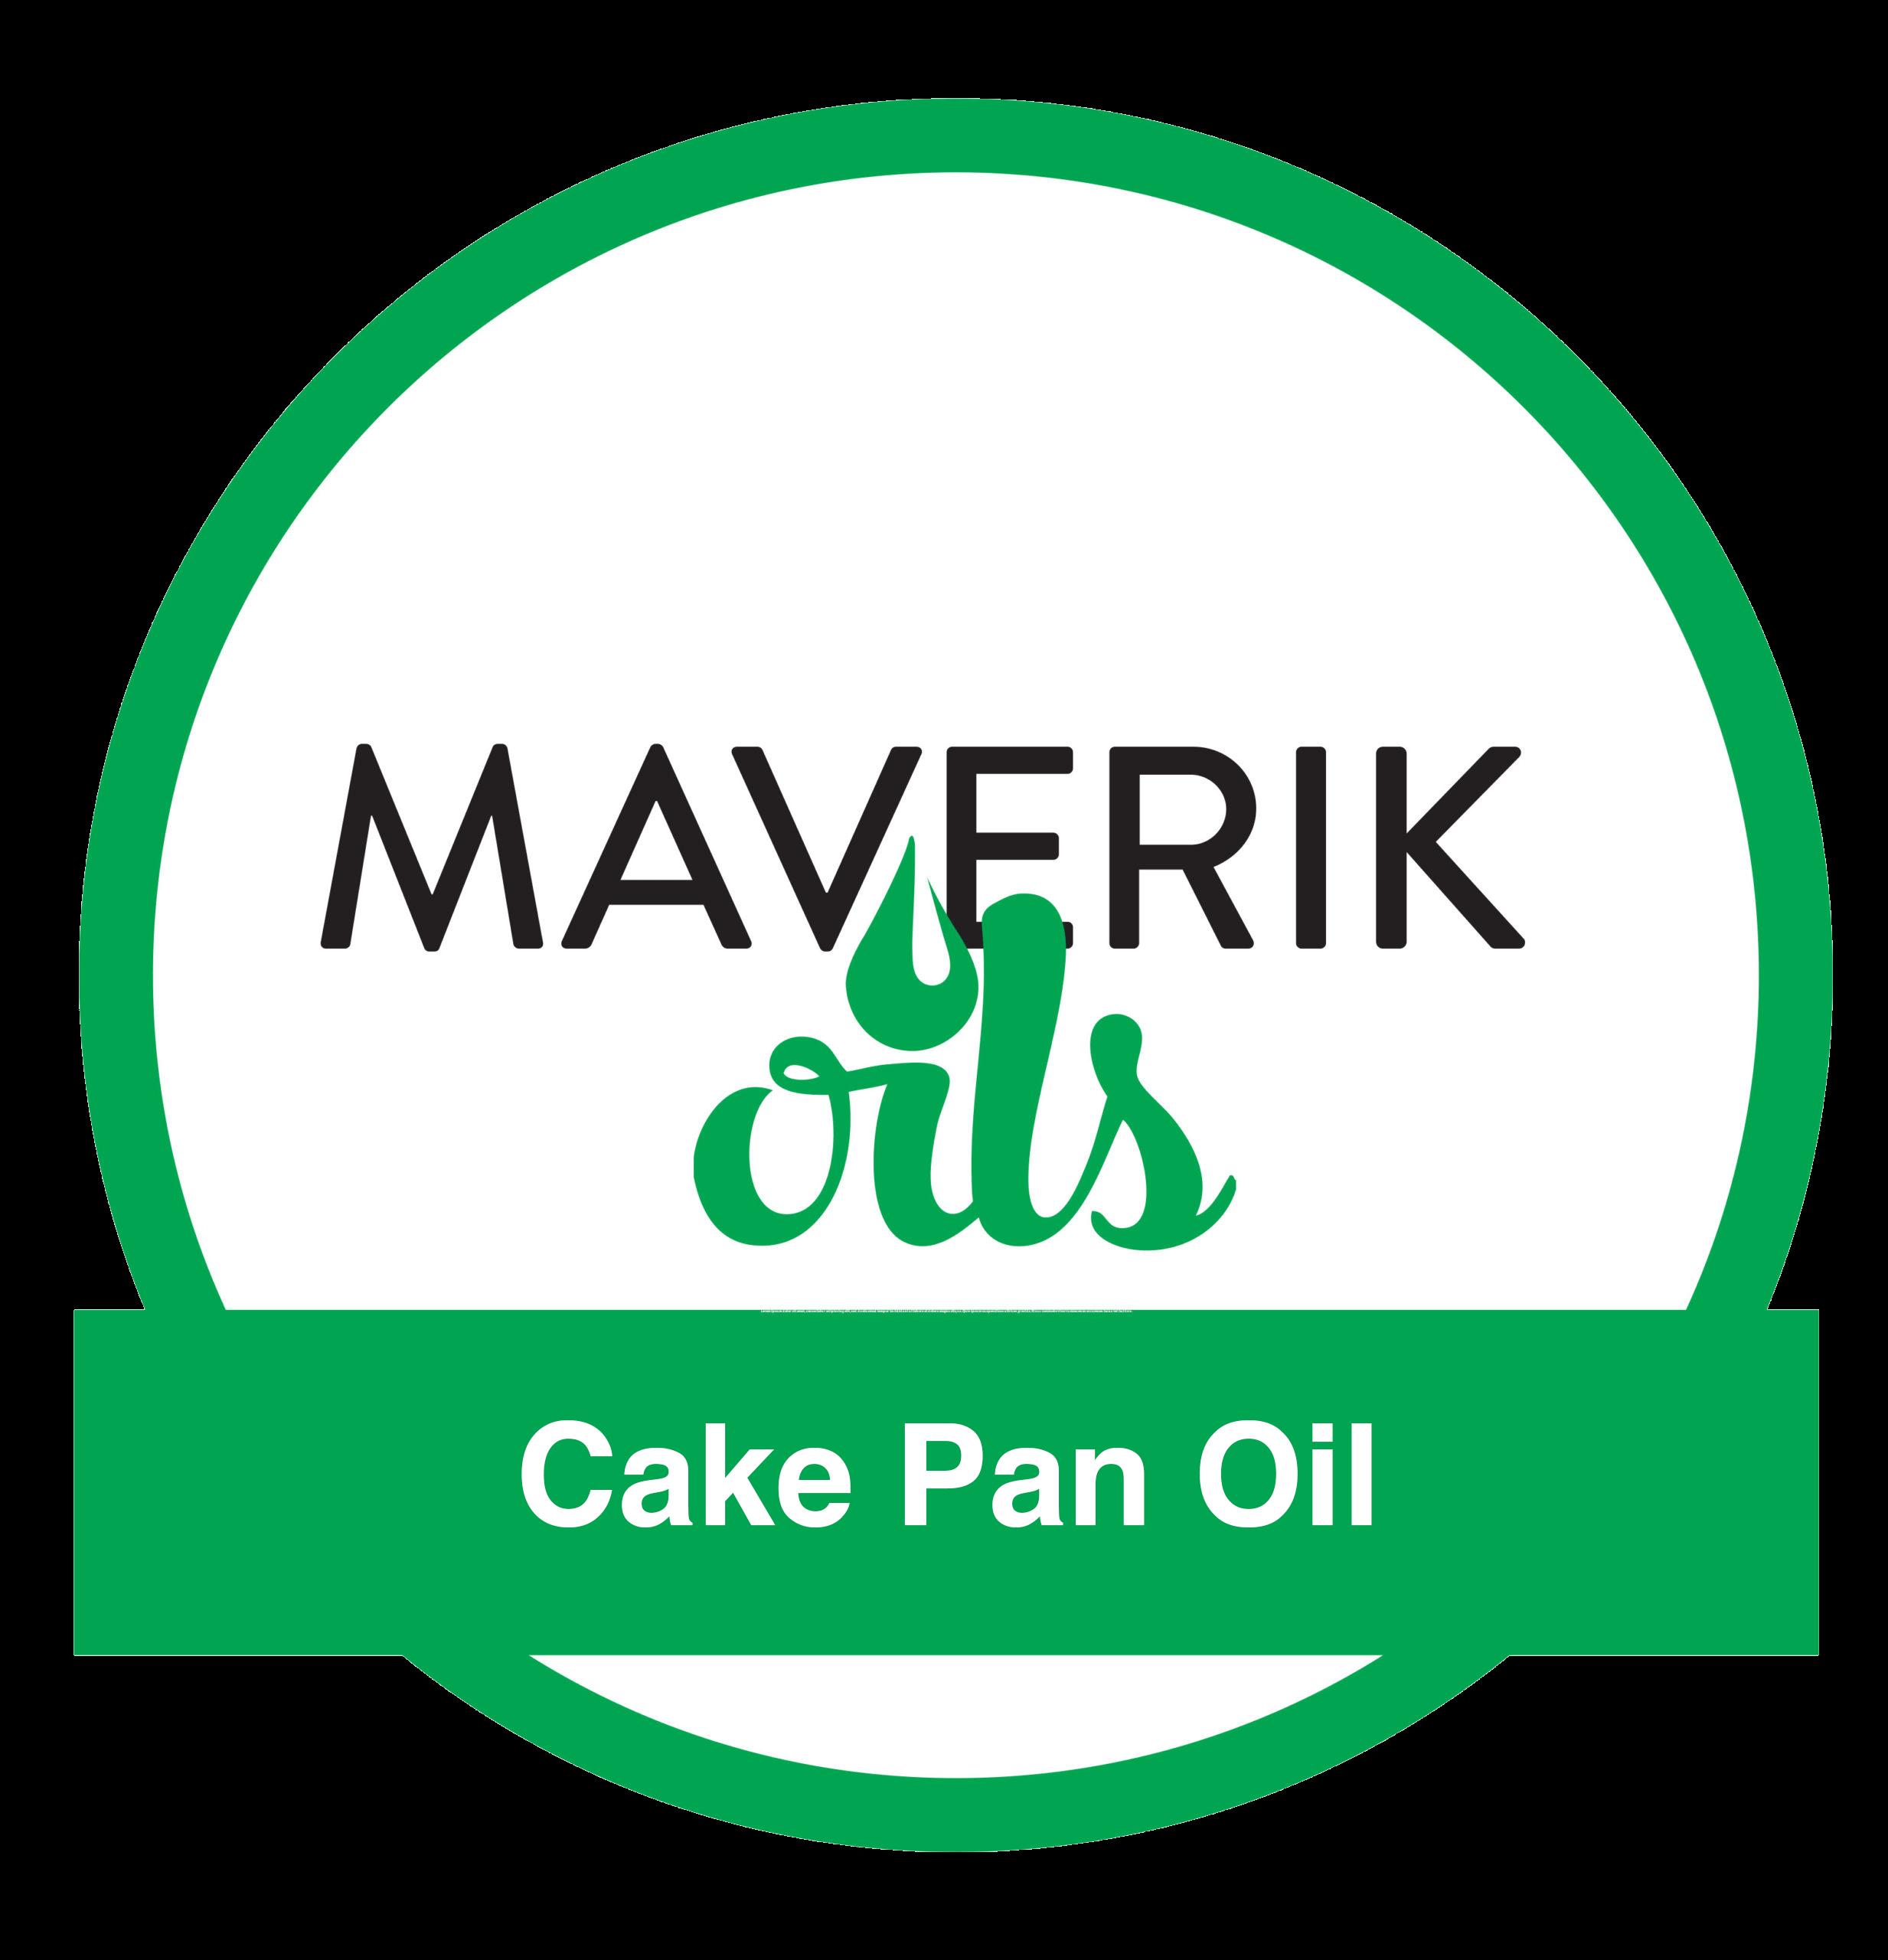 Cake Pan Oil